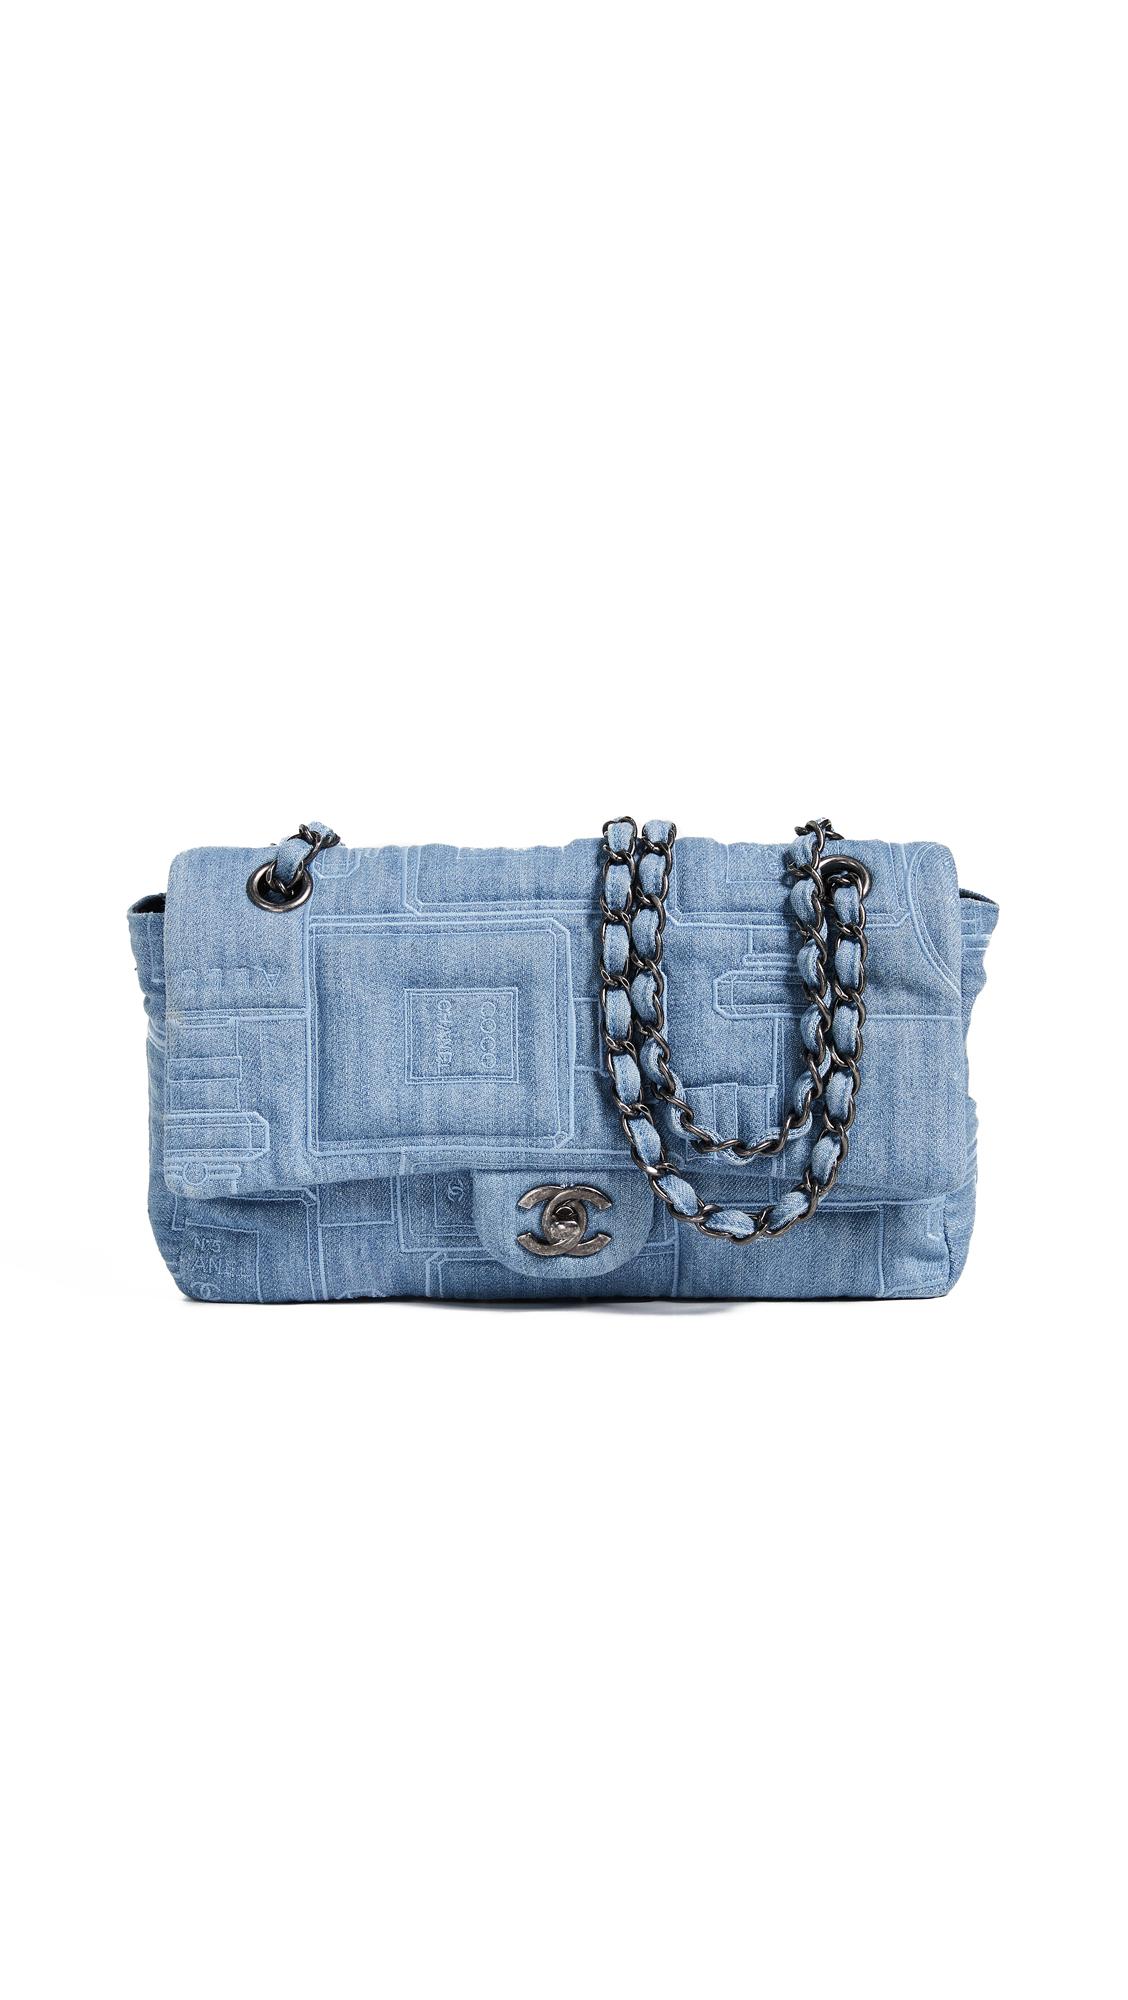 c44a1d06f26ed2 What Goes Around Comes Around Chanel Blue Denim Half Flap 10